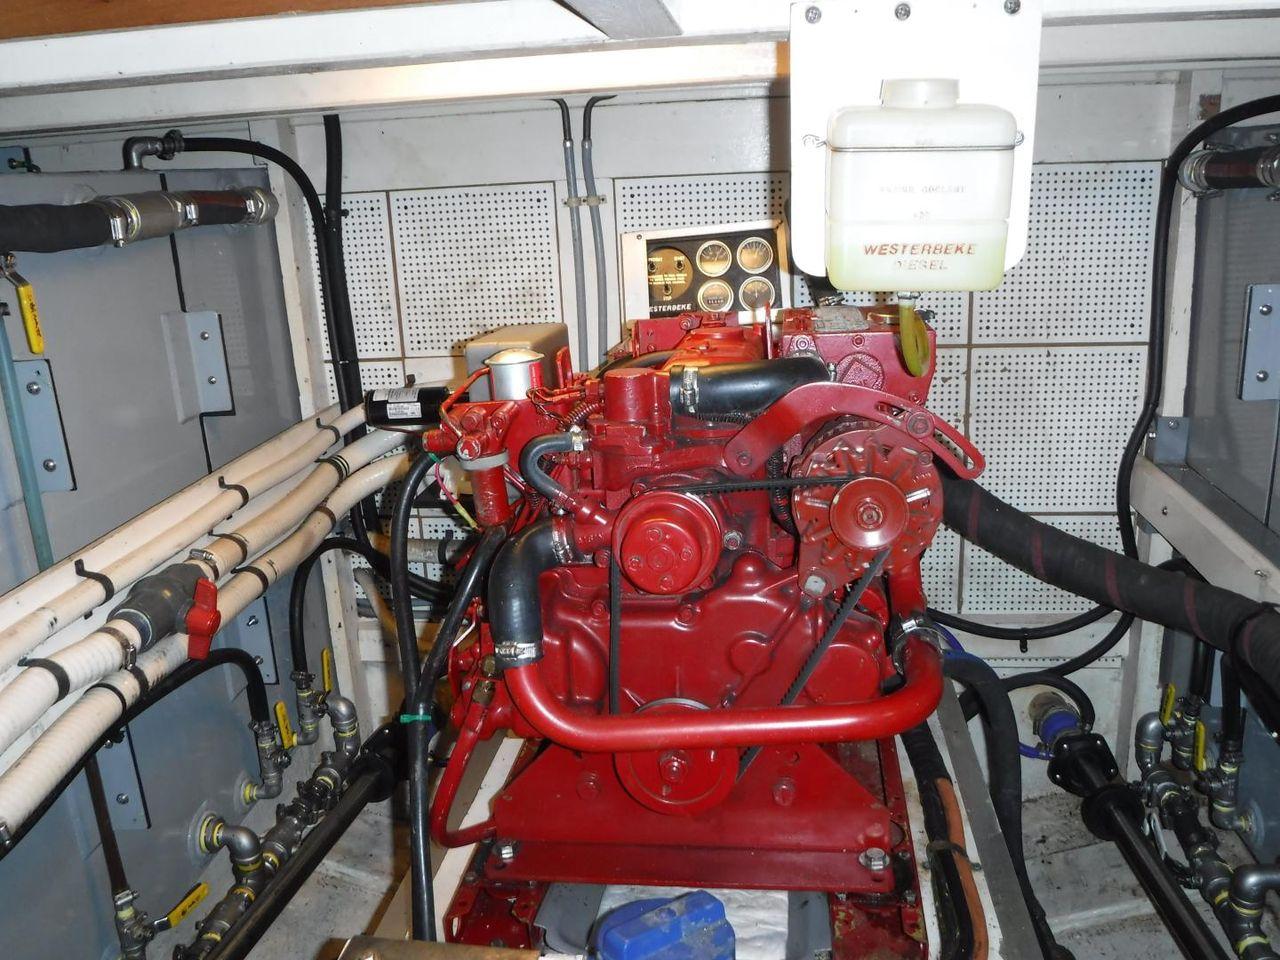 1984 Used Grand Banks 42 Classic Trawler Boat For Sale 159900 Lehman 12 Volt Motor Wiring Diagram